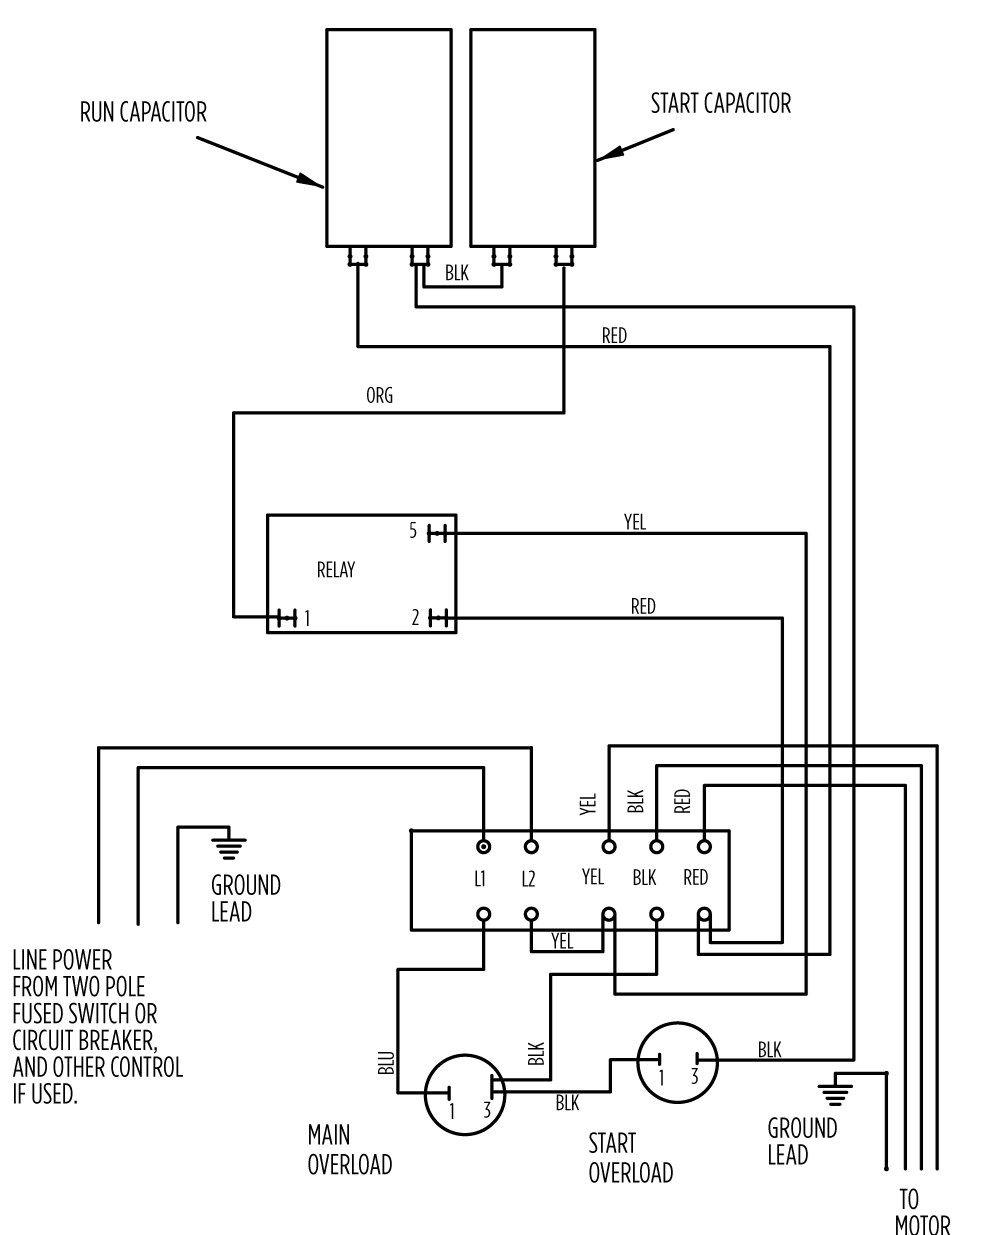 medium resolution of wiring diagram for 220 volt submersible pump wiring diagram 220 submersible pump wiring diagram